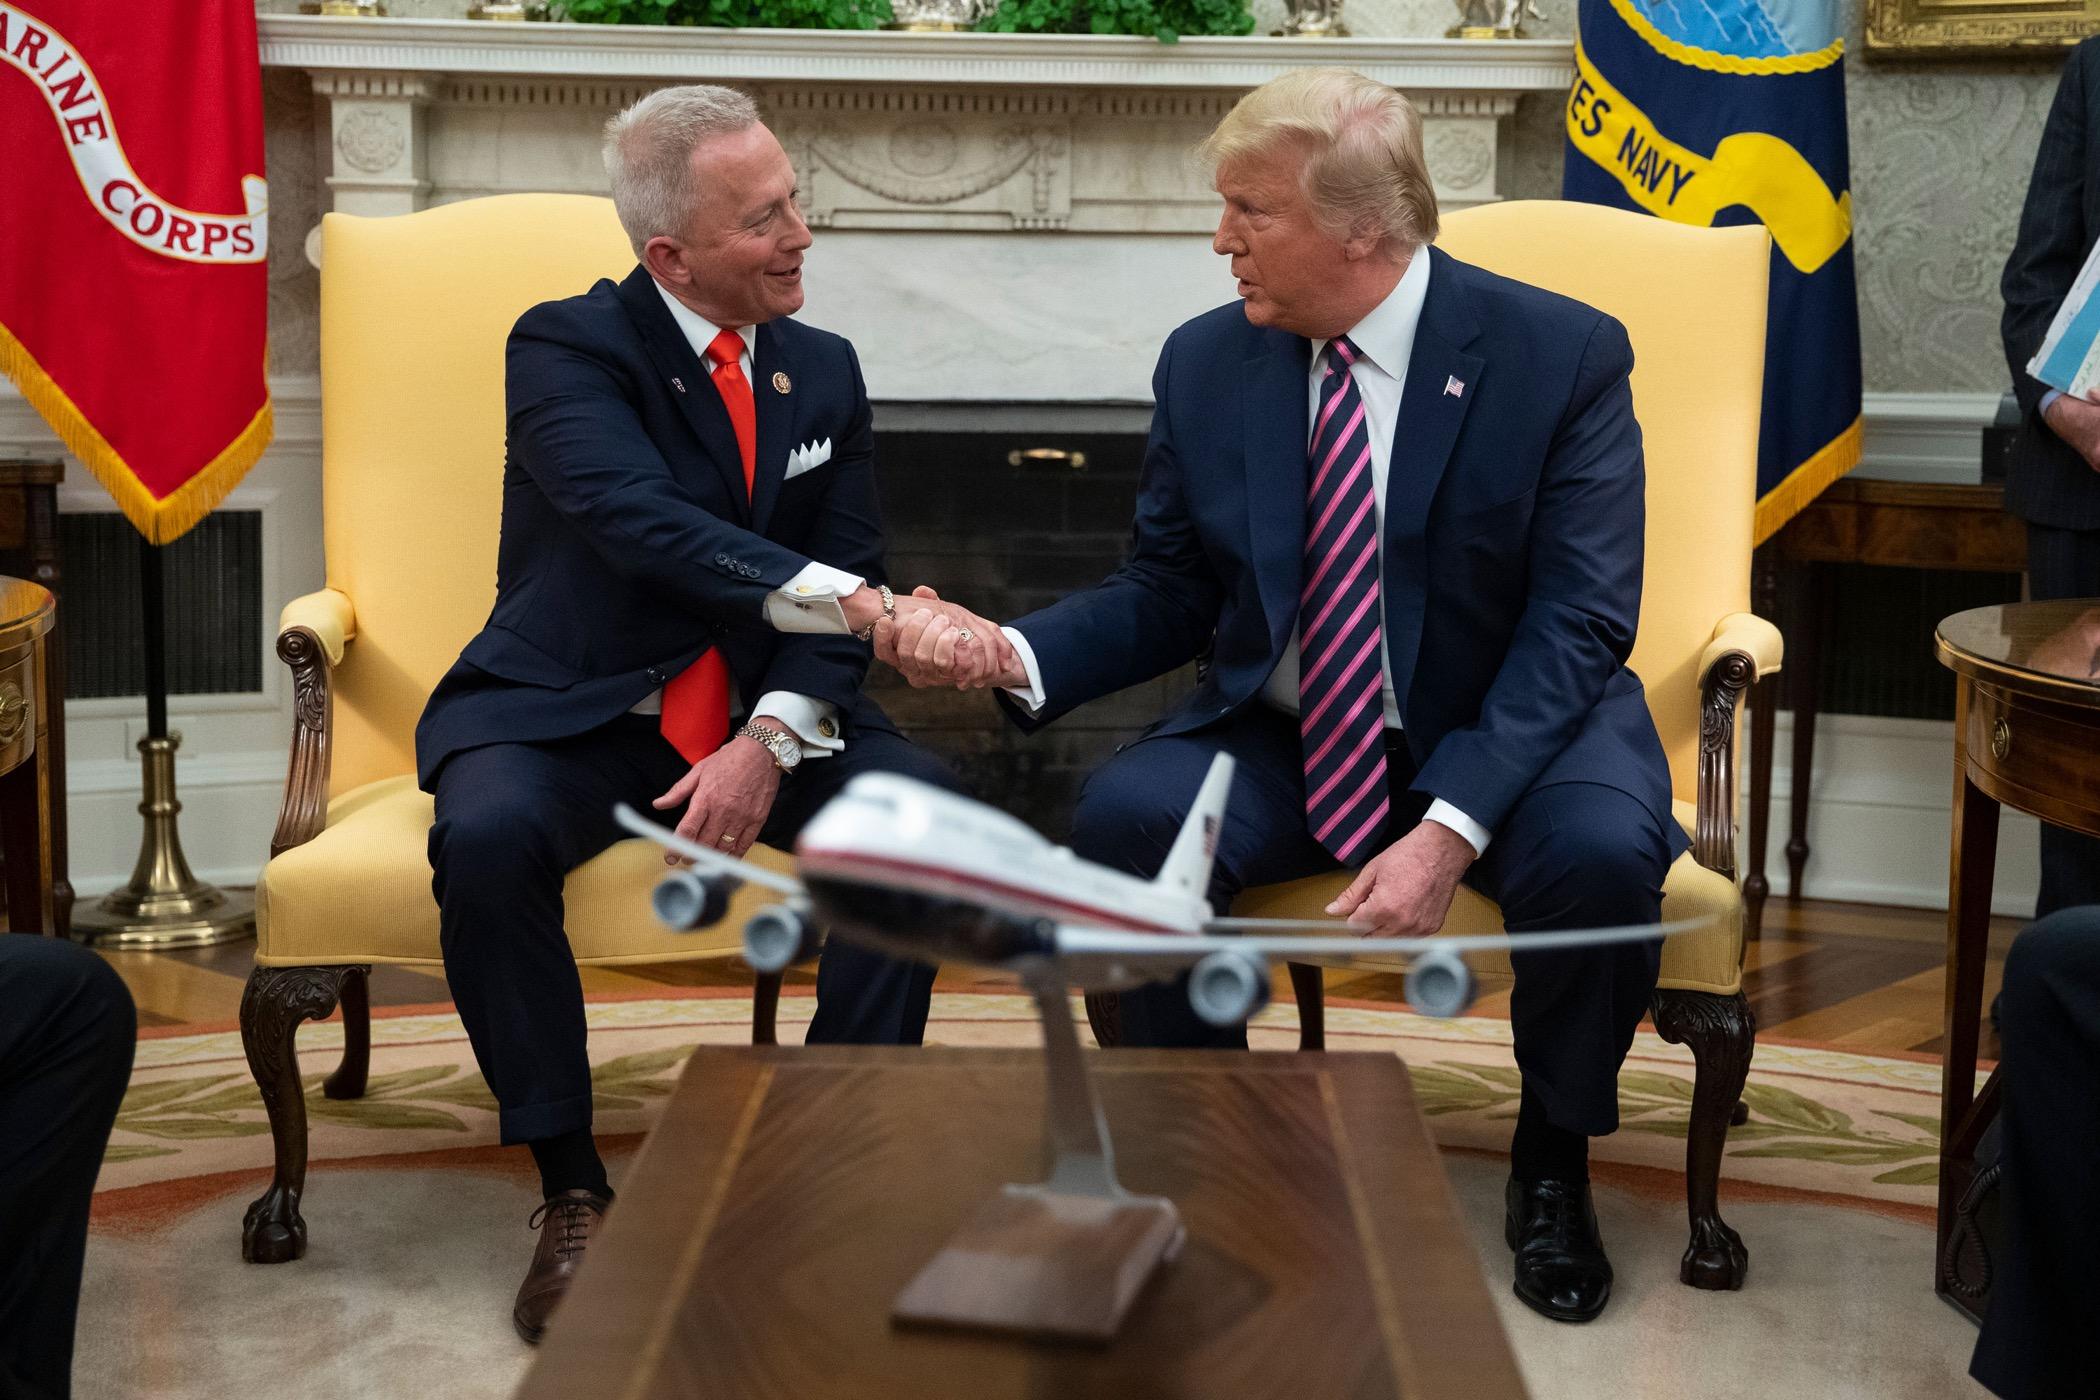 Rep. Jeff Van Drew and President Donald Trump